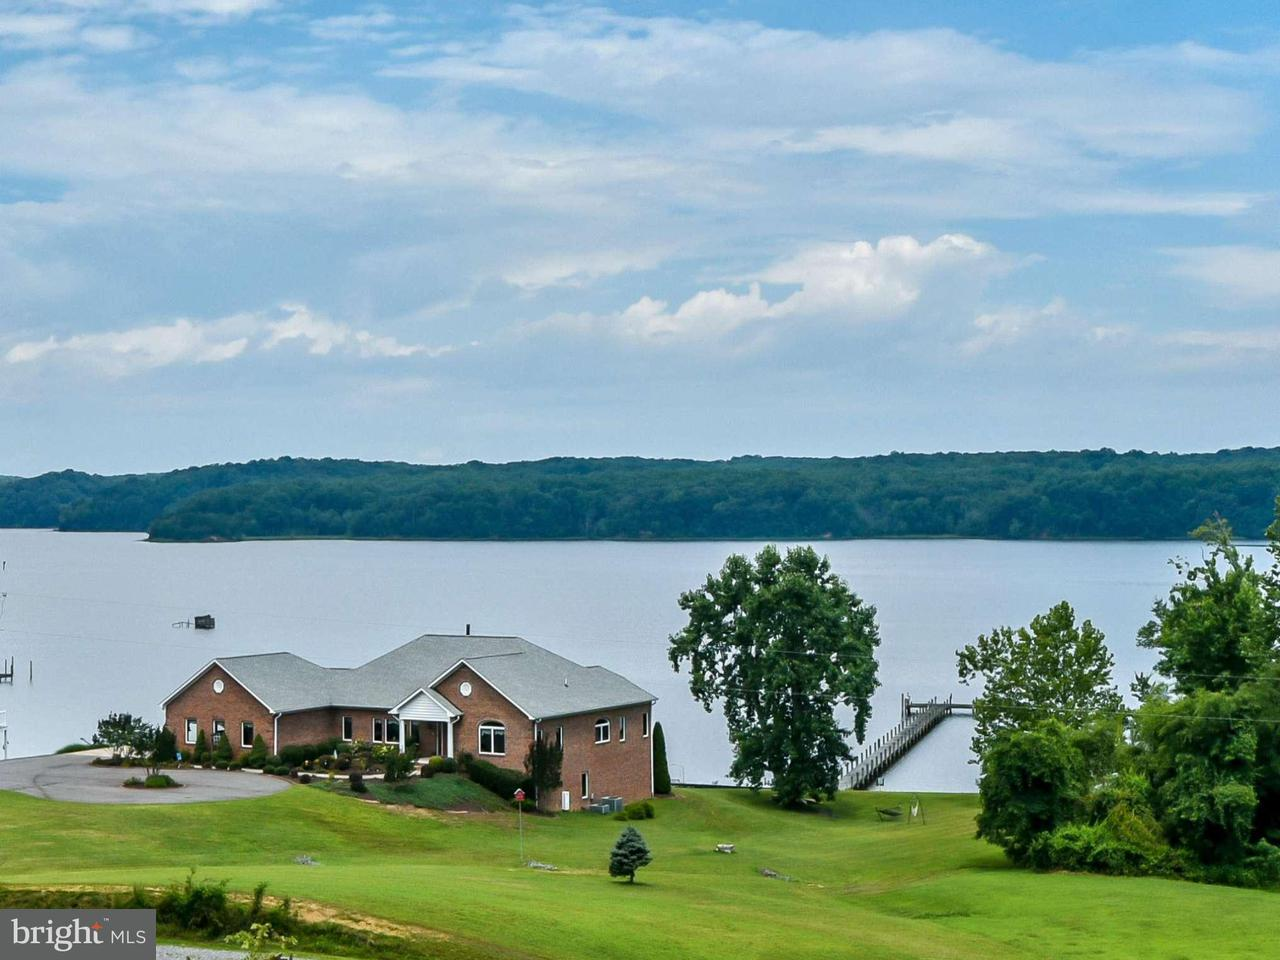 独户住宅 为 销售 在 5718 COVE HARBOUR Drive 5718 COVE HARBOUR Drive 乔治, 弗吉尼亚州 22485 美国